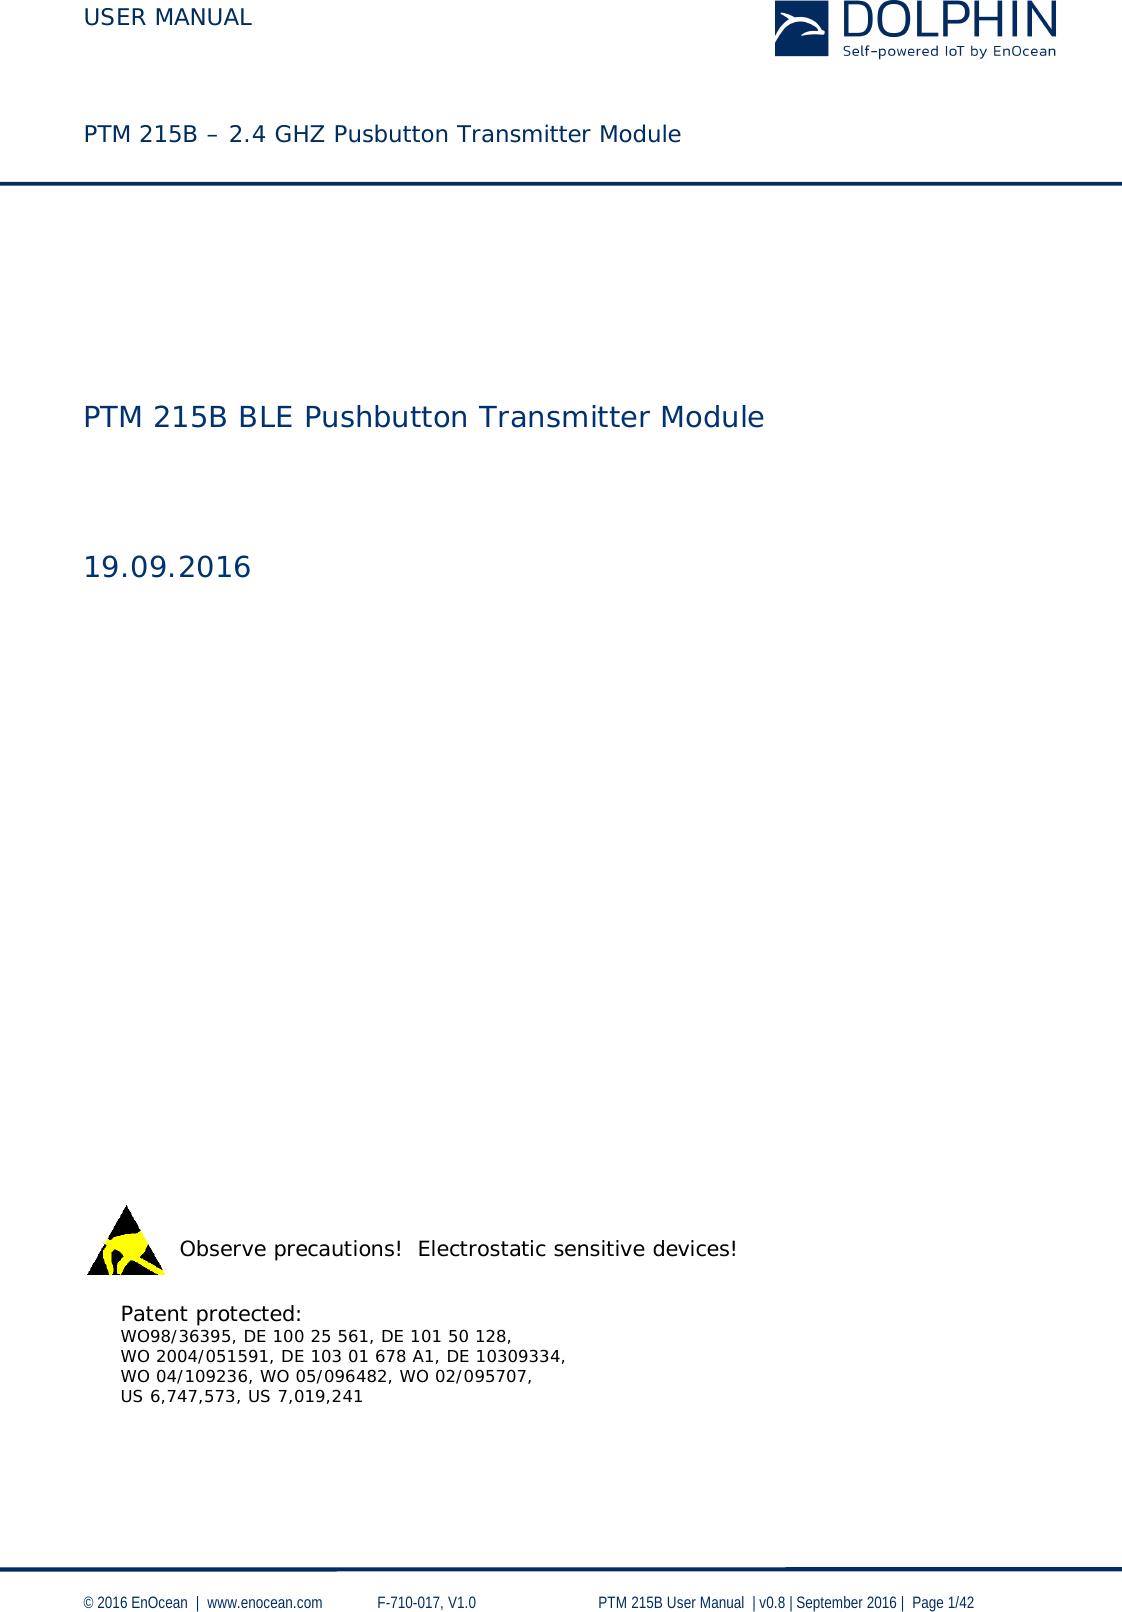 USER MANUAL    PTM 215B – 2.4 GHZ Pusbutton Transmitter Module  © 2016 EnOcean     www.enocean.com   F-710-017, V1.0        PTM 215B User Manual    v0.8   September 2016    Page 1/42                             Patent protected: WO98/36395, DE 100 25 561, DE 101 50 128,  WO 2004/051591, DE 103 01 678 A1, DE 10309334,  WO 04/109236, WO 05/096482, WO 02/095707, US 6,747,573, US 7,019,241    Observe precautions!  Electrostatic sensitive devices!   PTM 215B BLE Pushbutton Transmitter Module    19.09.2016